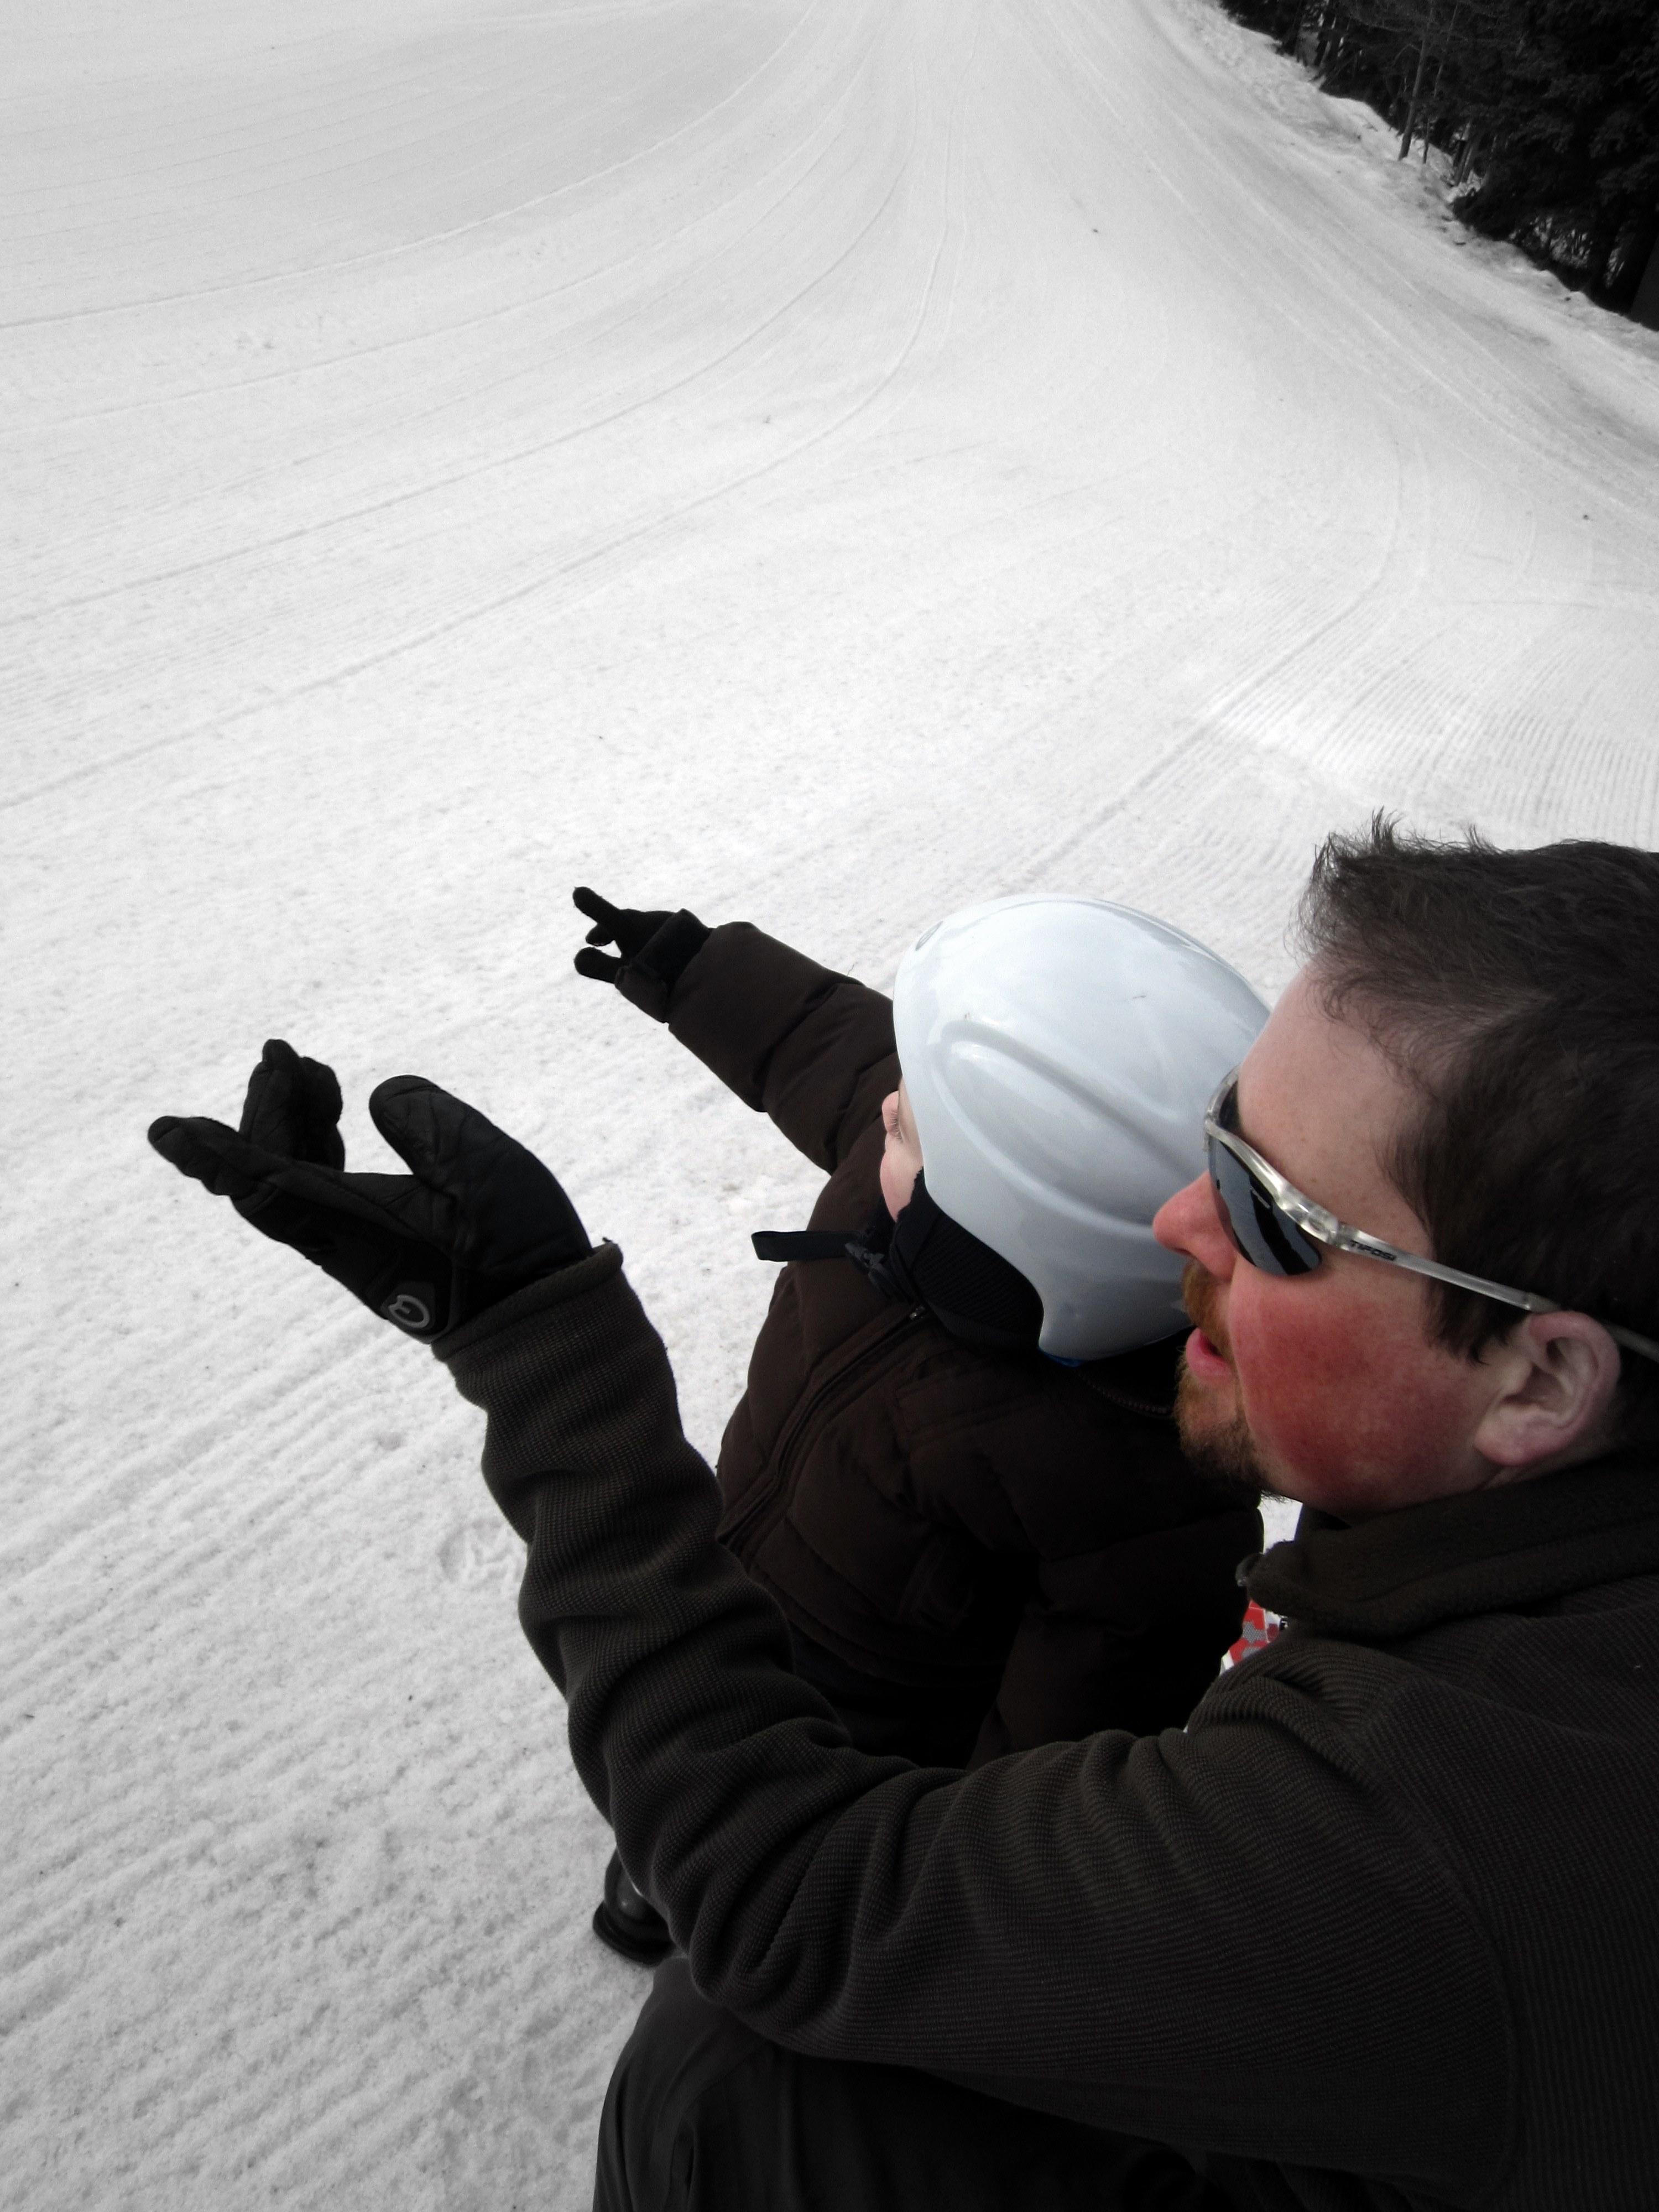 Watching Skiers